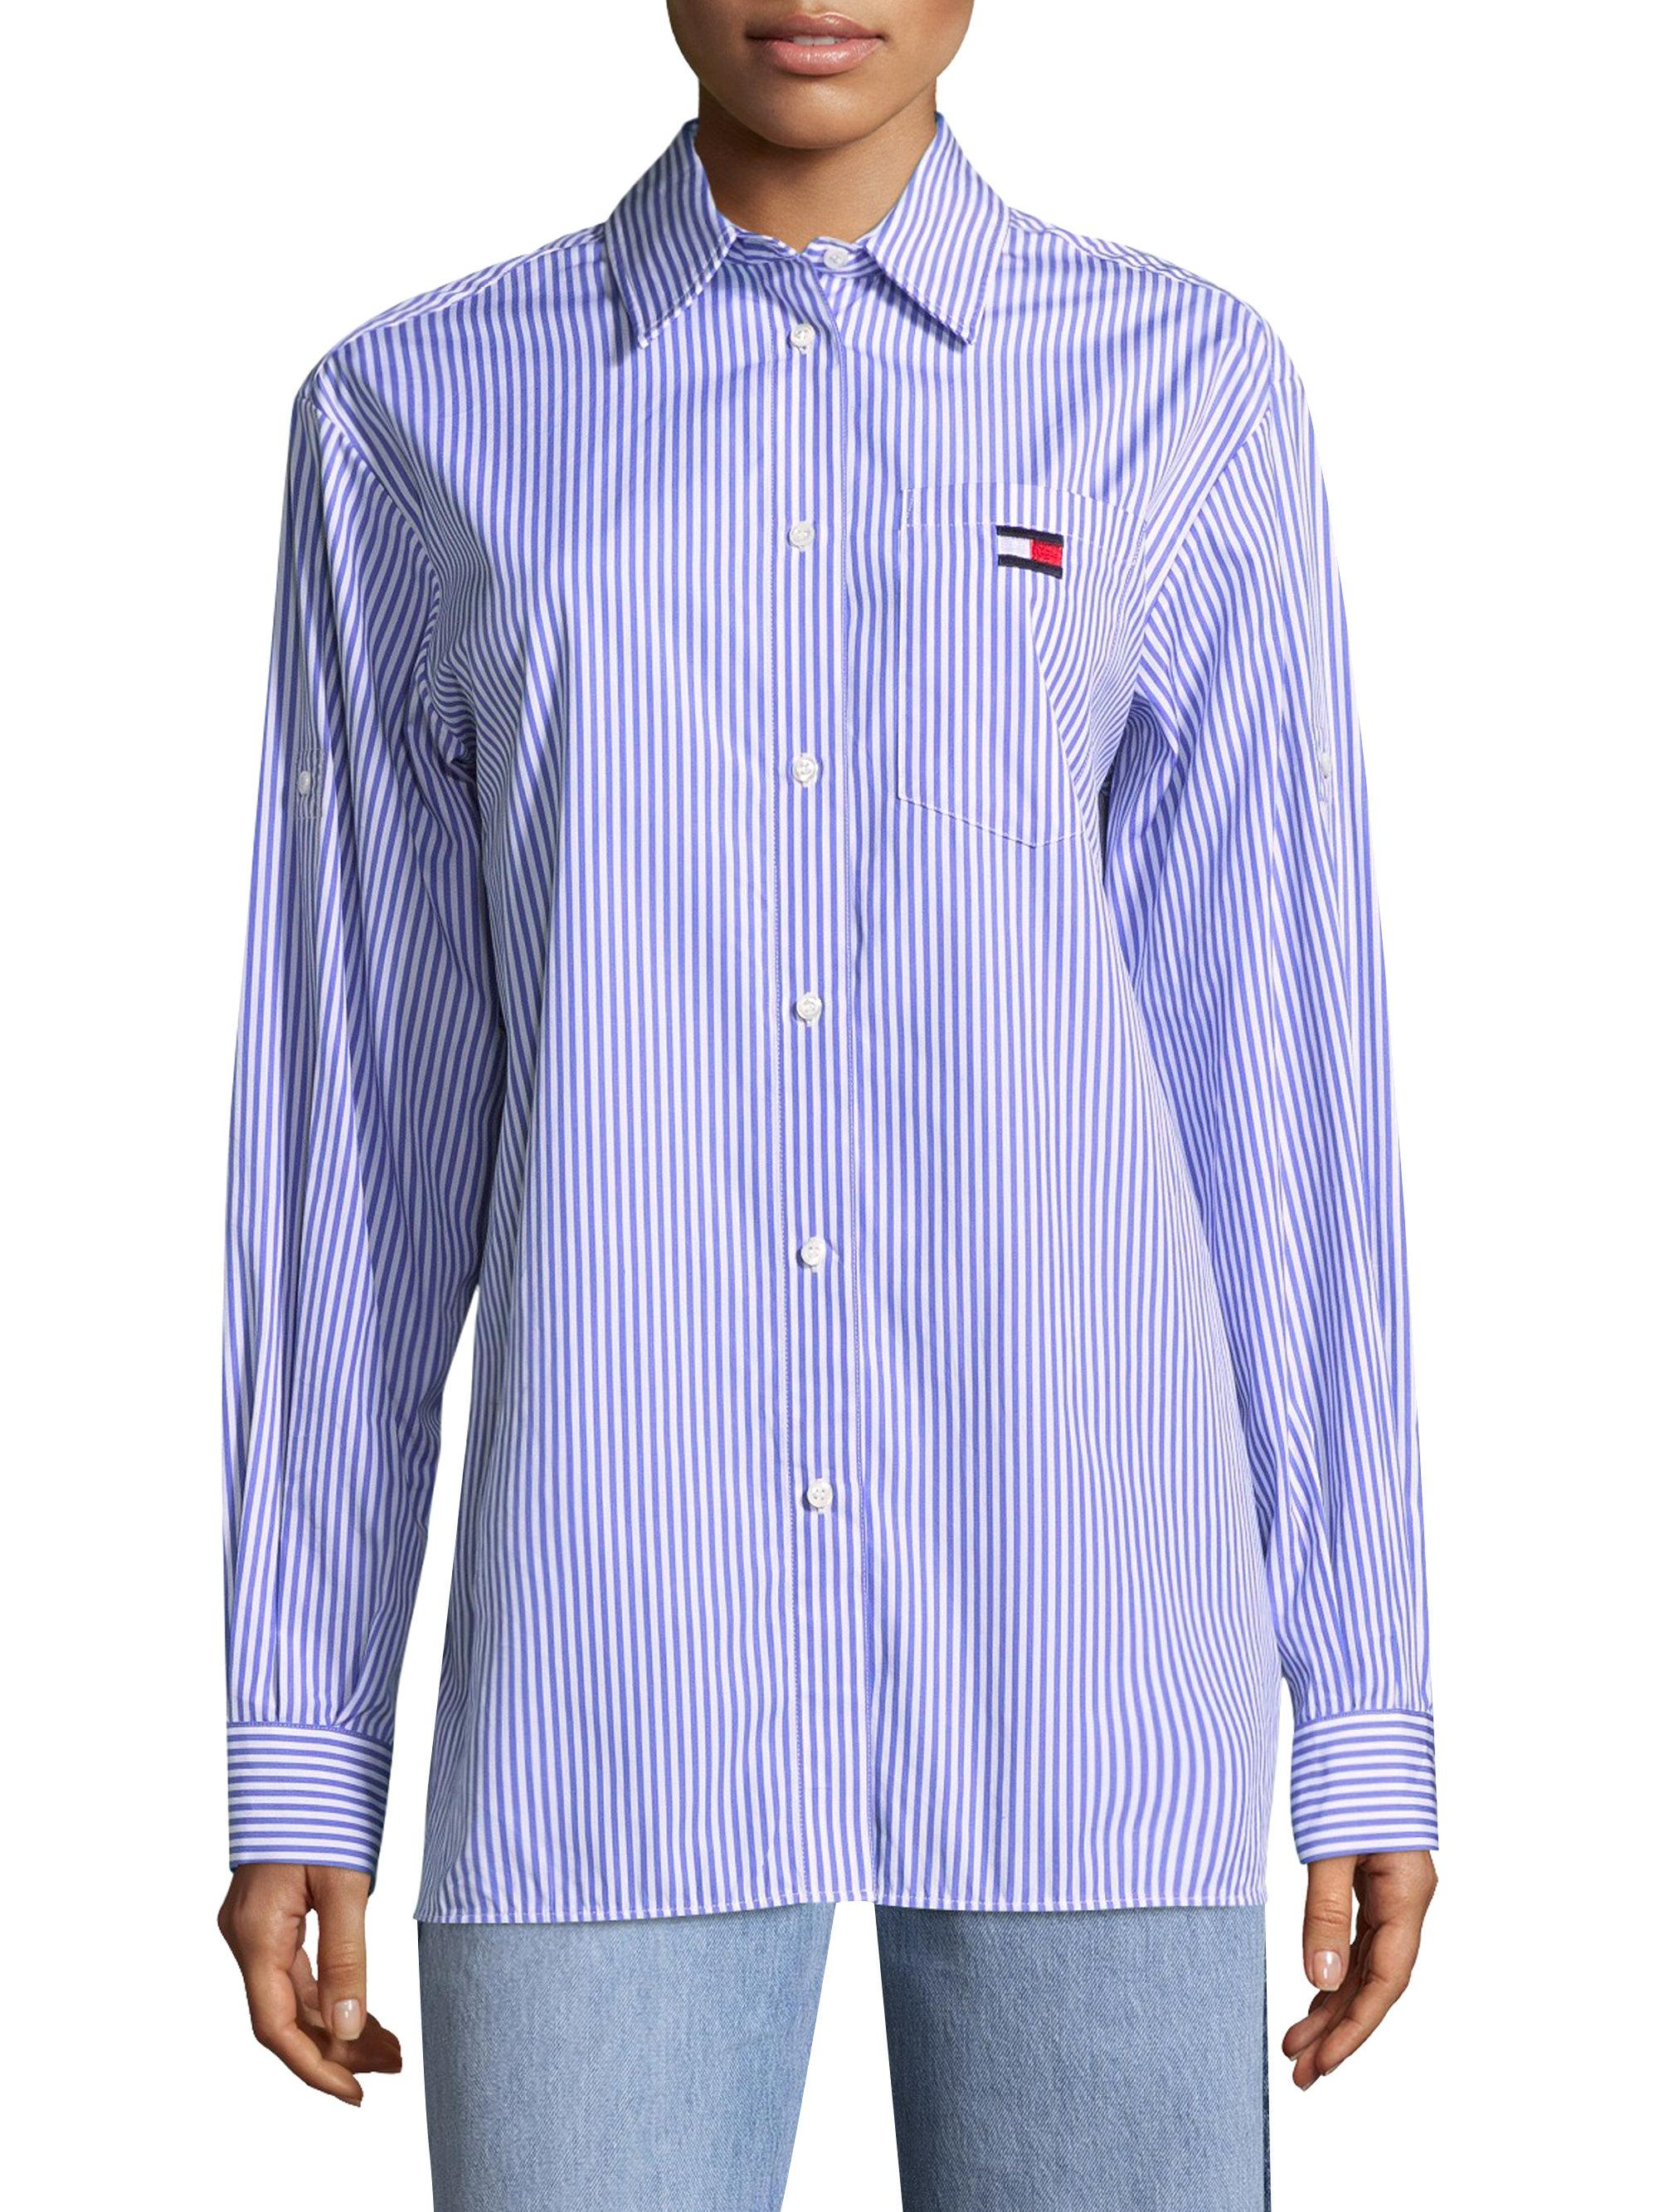 Lyst tommy hilfiger ithaca stripe shirt in blue for Tommy hilfiger fitzgerald striped shirt